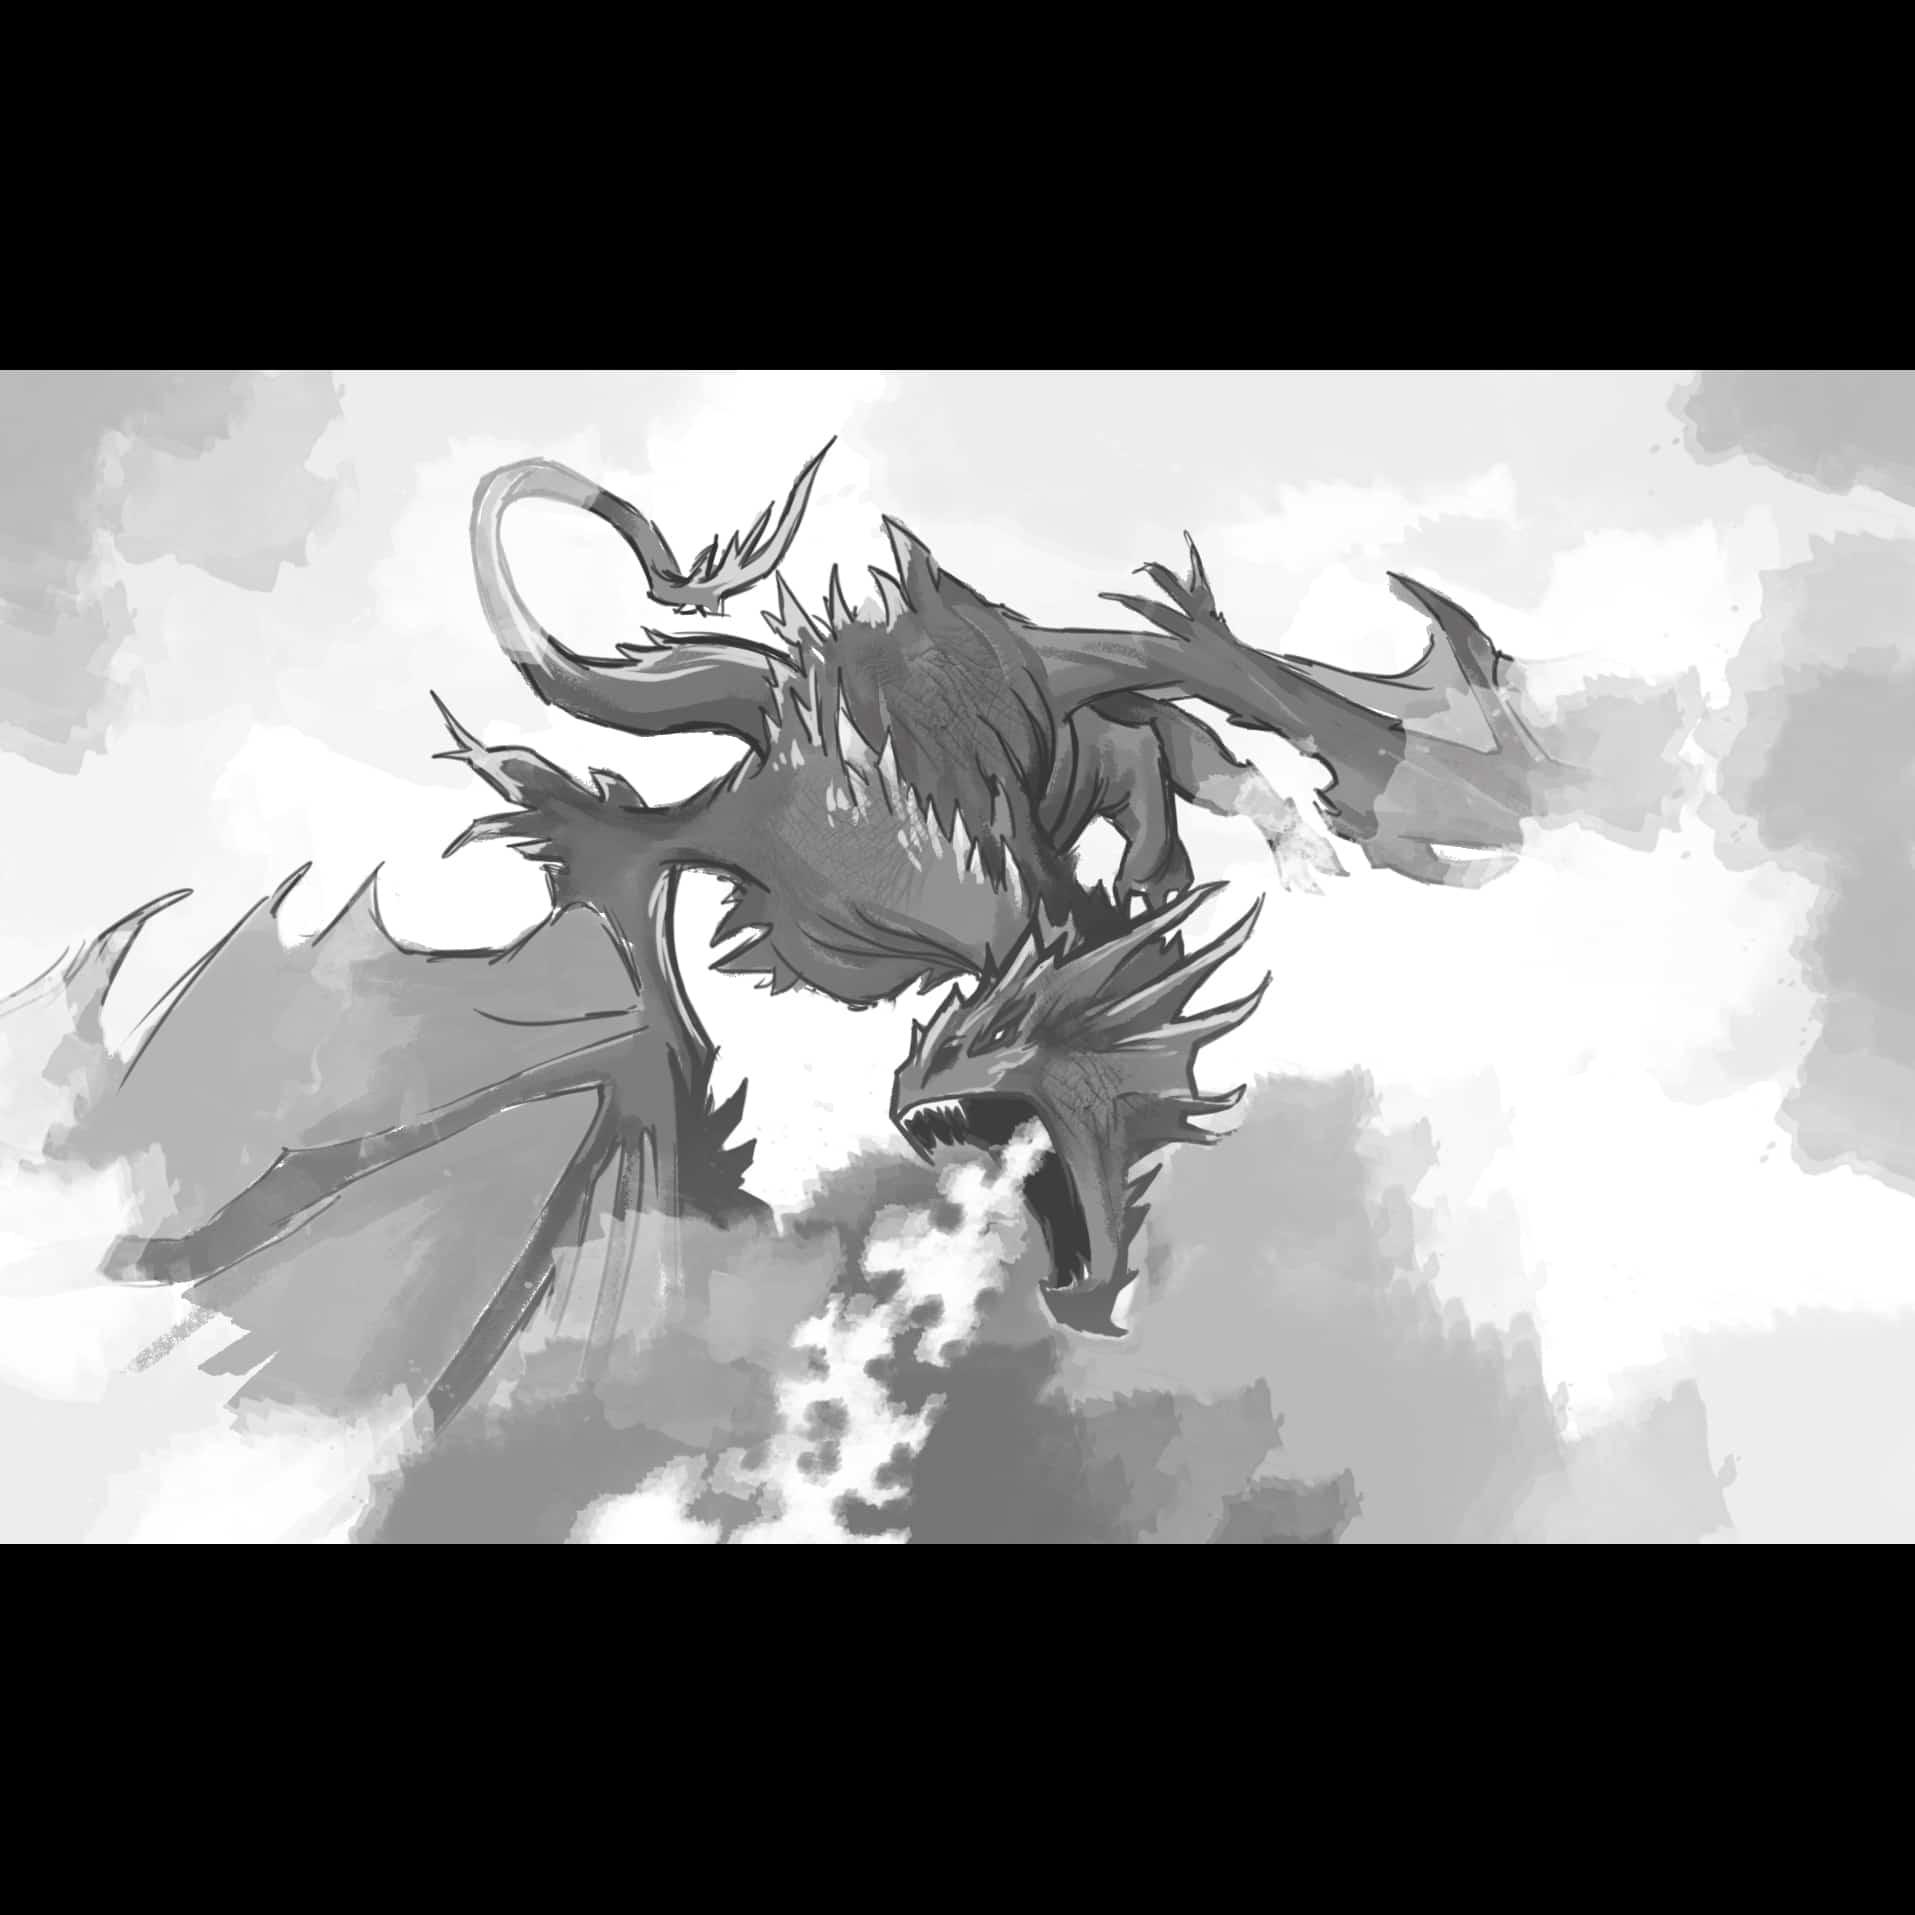 Dragon storyboard illustration